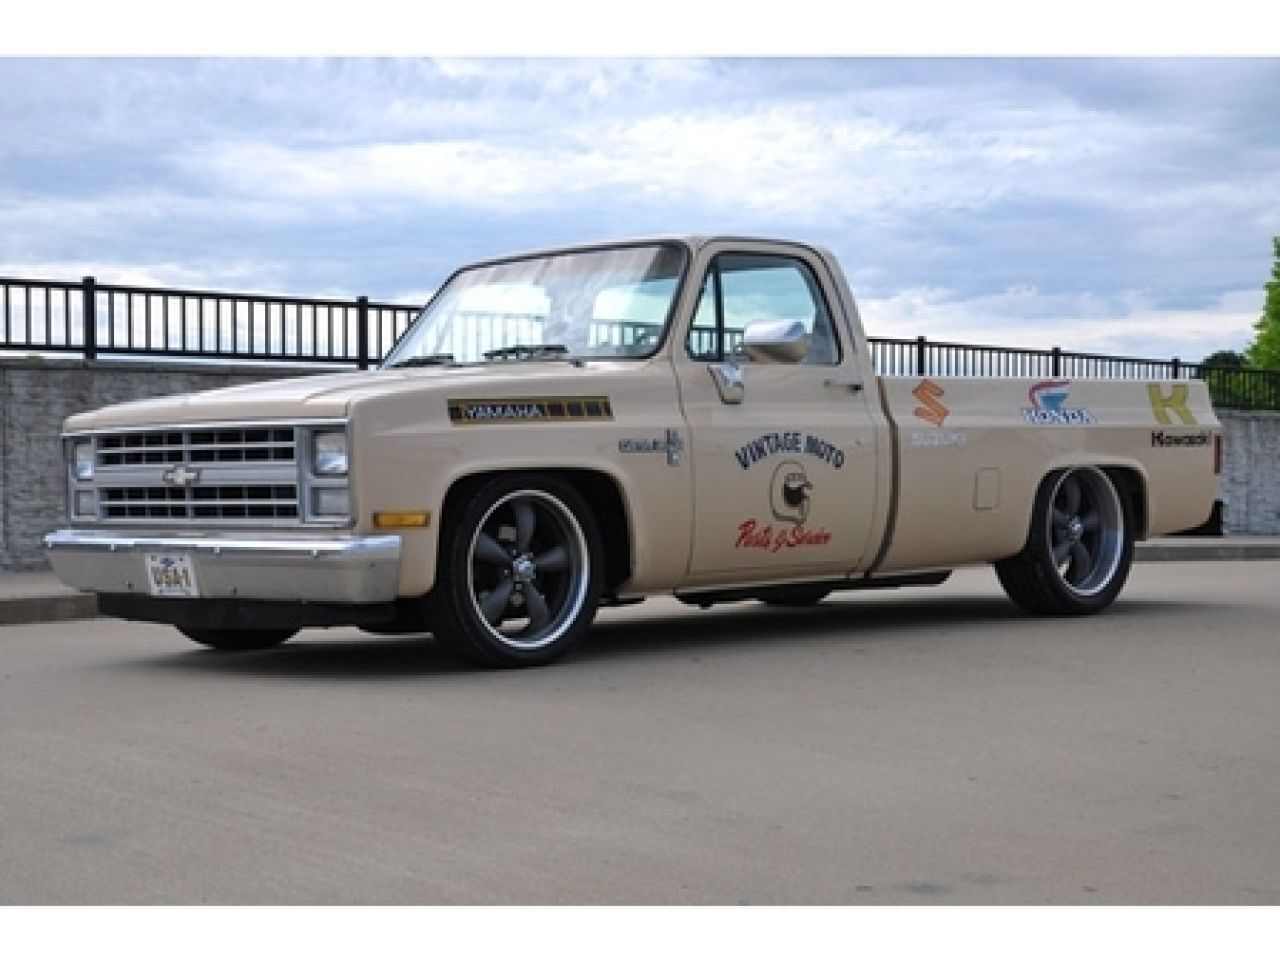 1987 Chevrolet C10 Pickup Truck - Ebay Motors San Jose, CA for ...